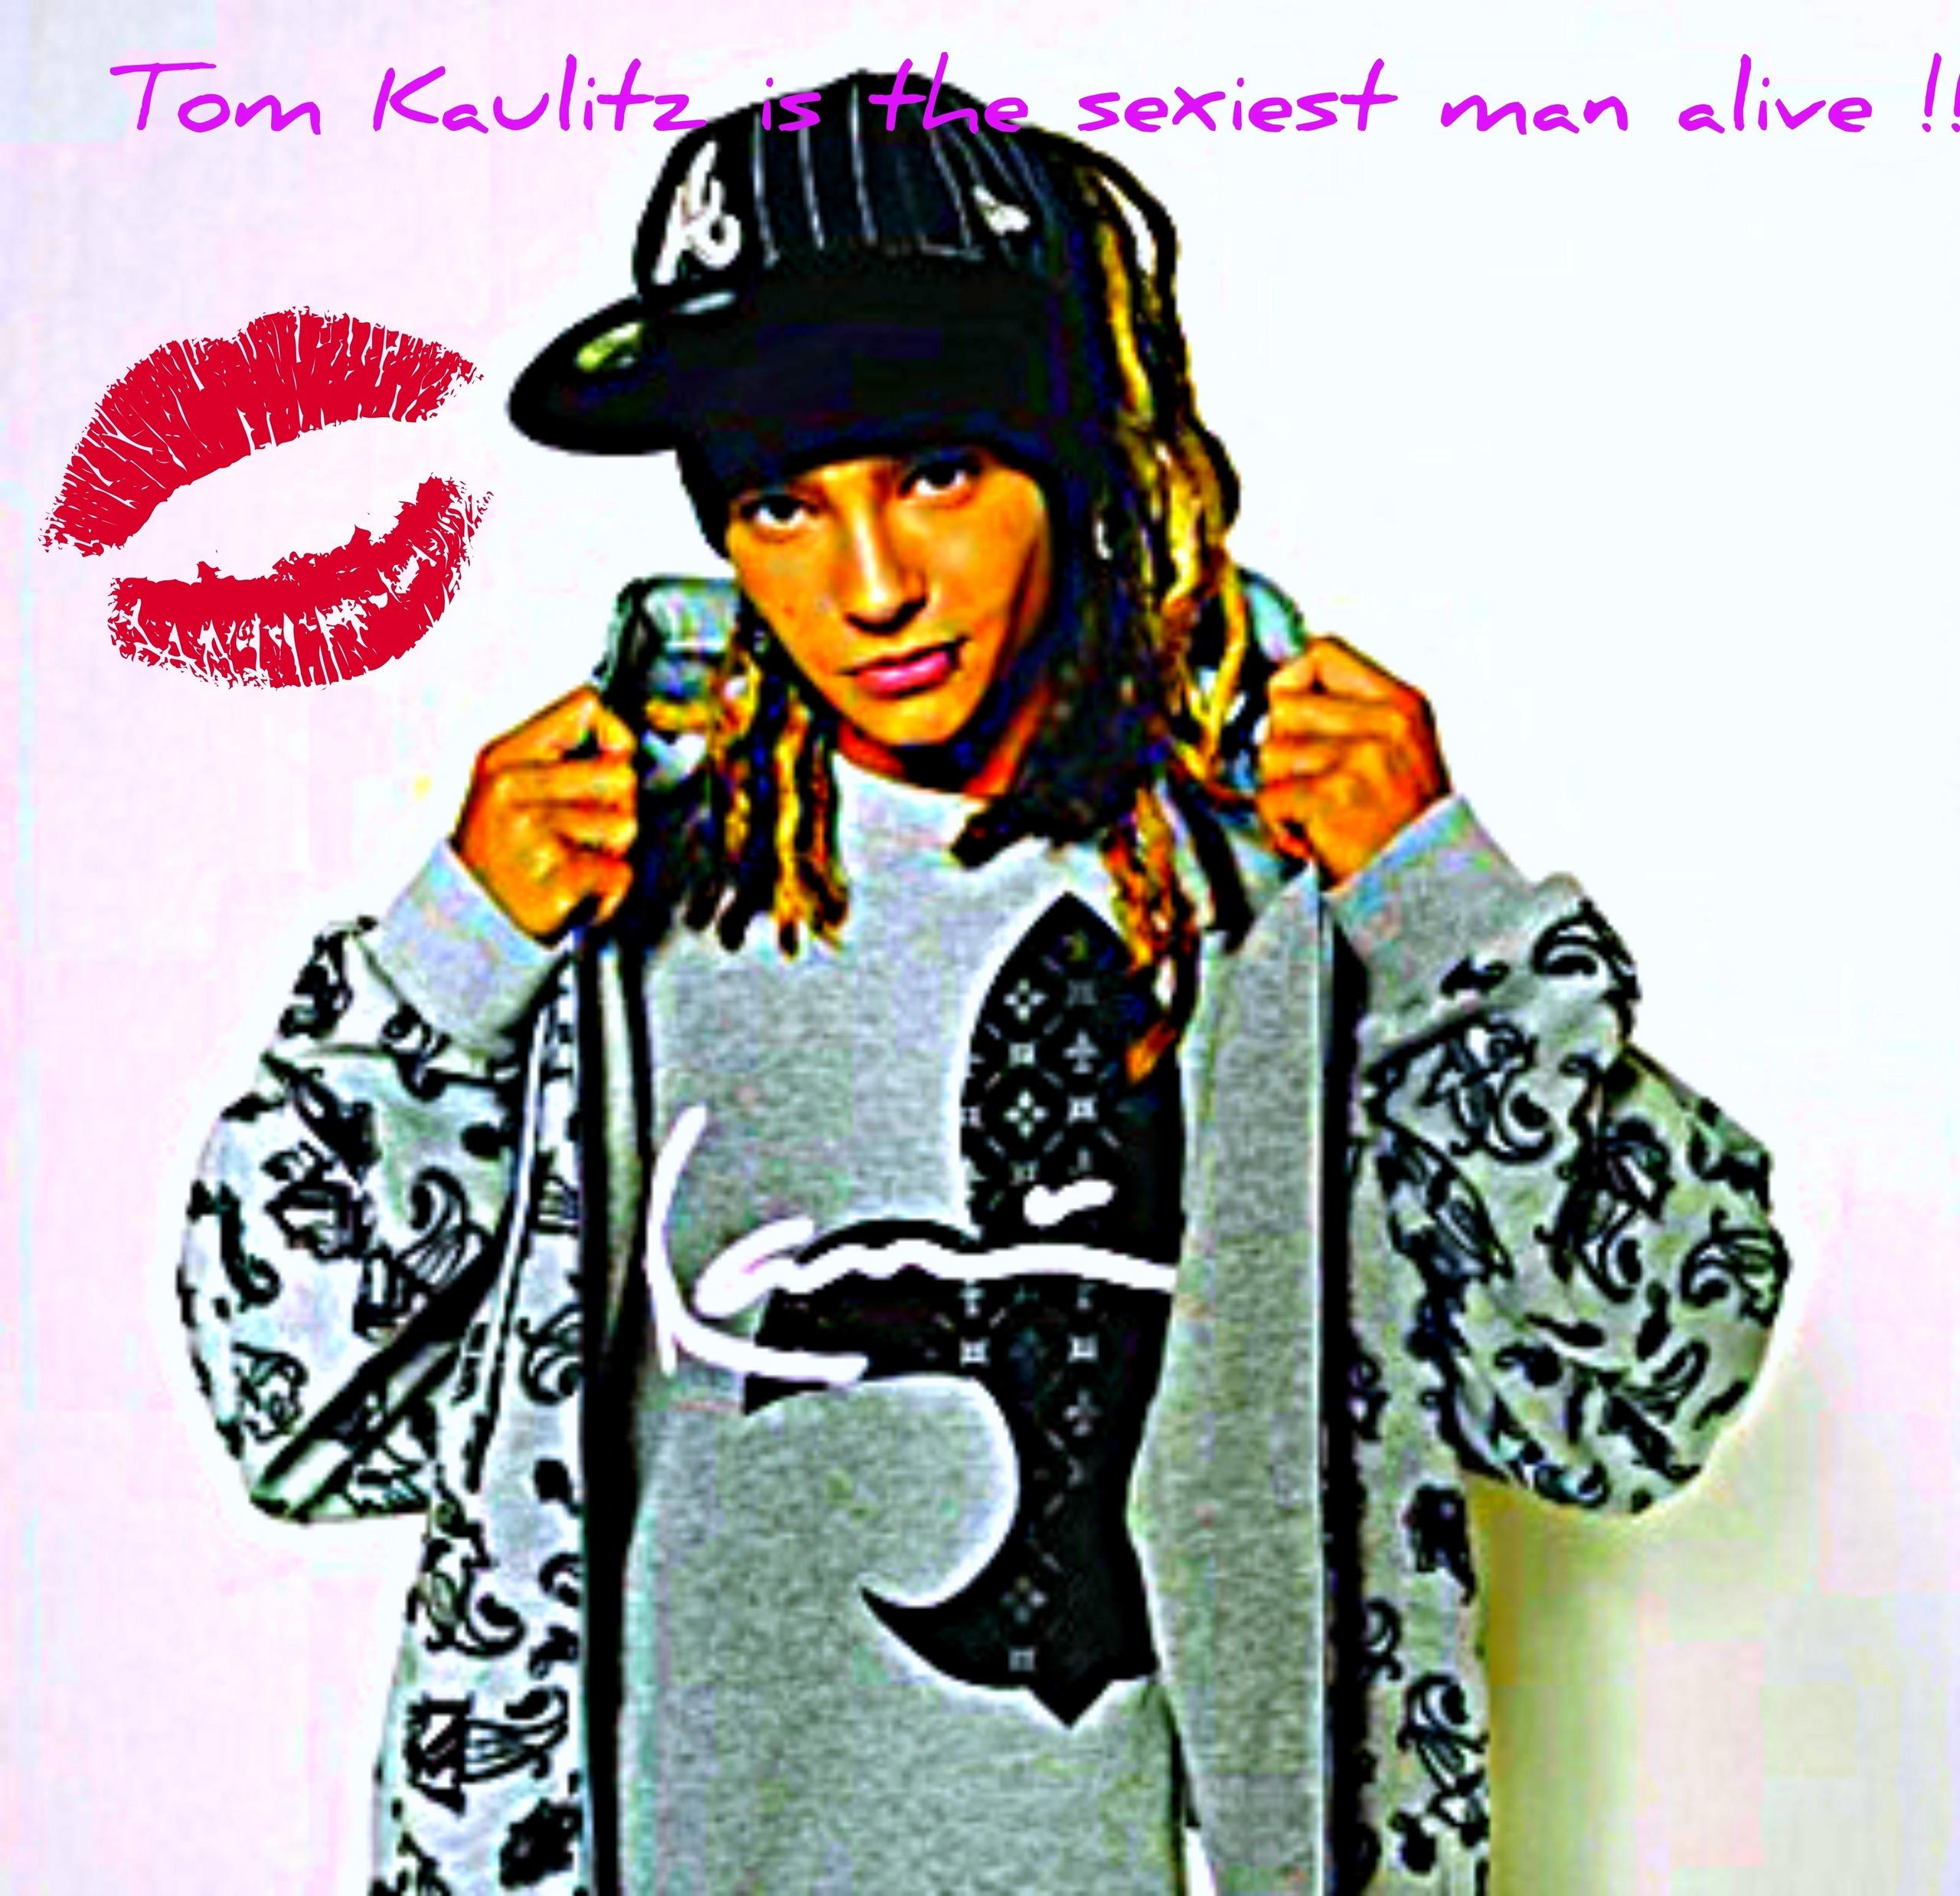 Tom Kaulitz is sex.